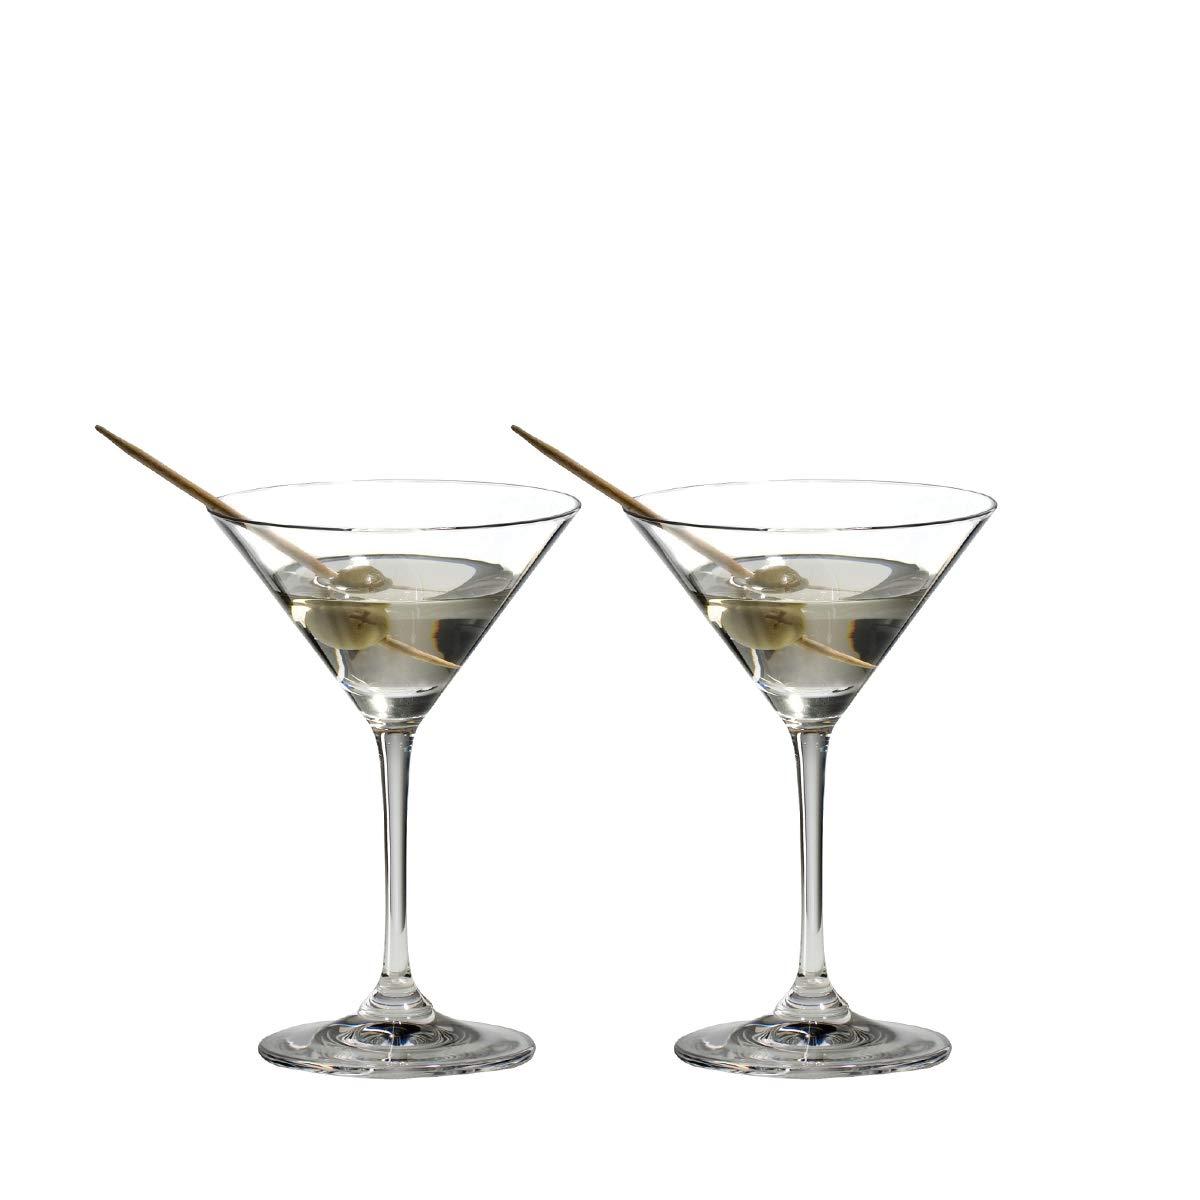 Riedel VINUM Martini Glasses, Set of 2